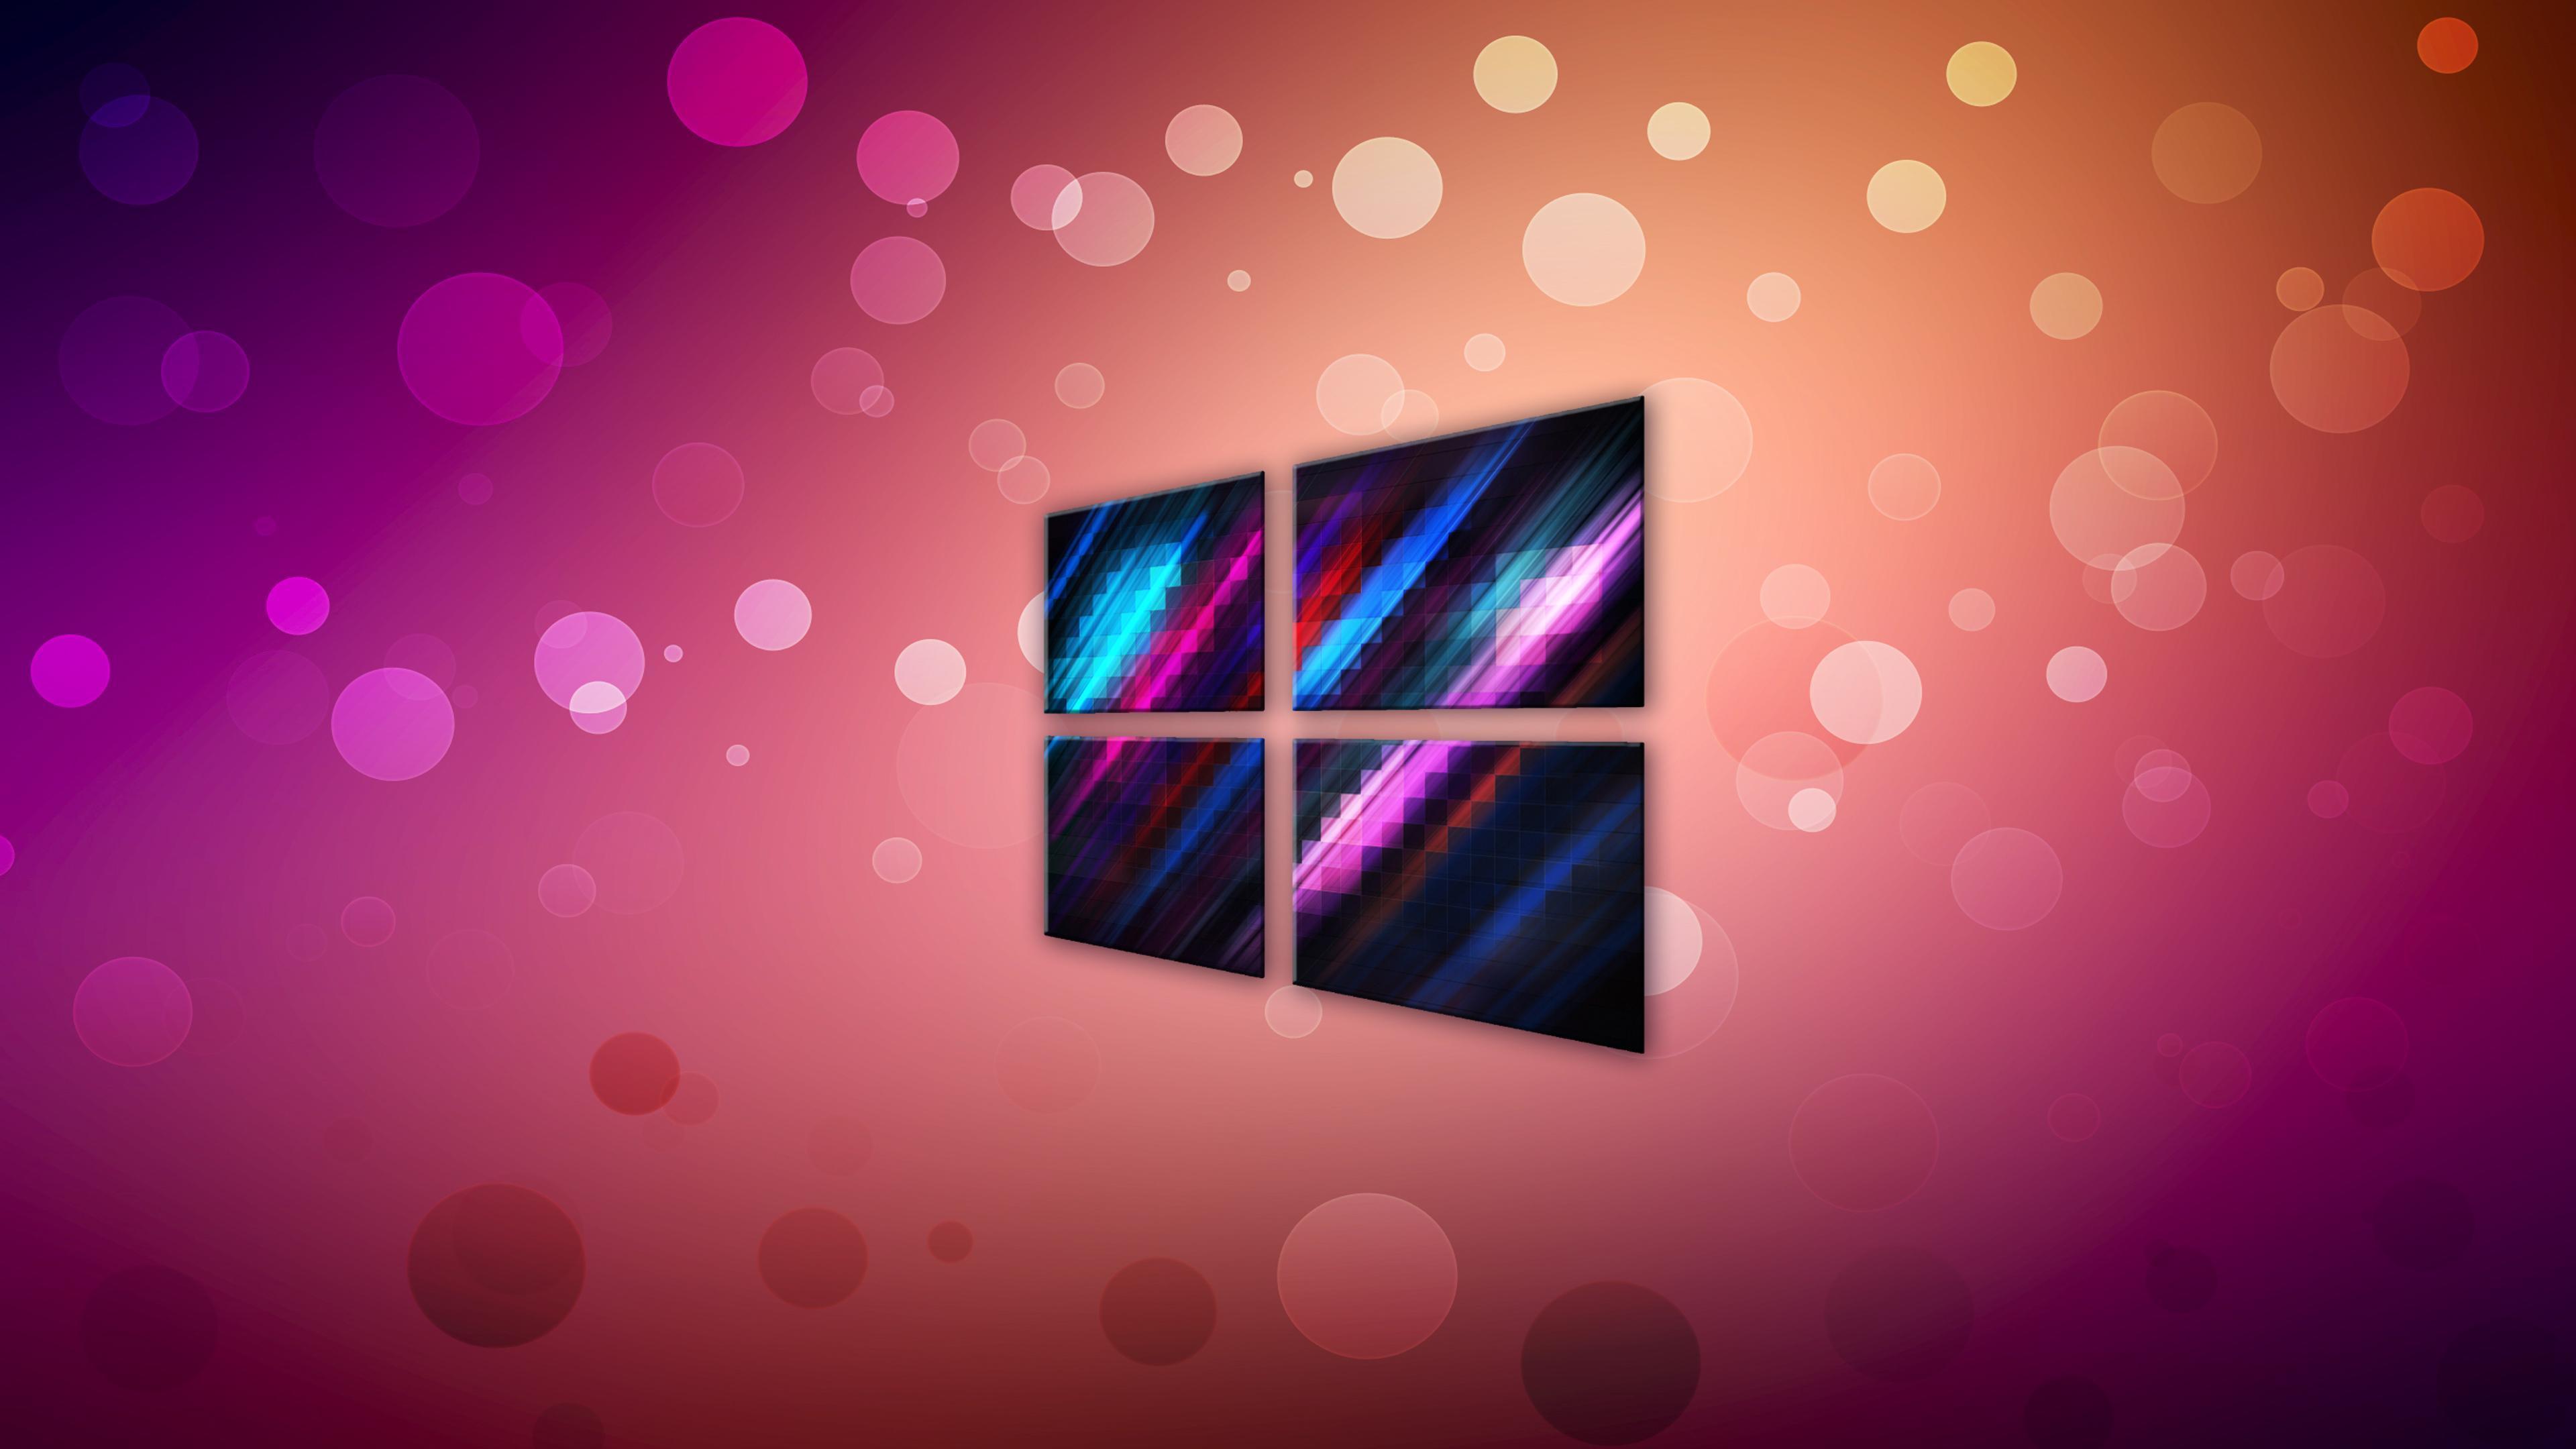 Обои На Экран Блокировки Ноутбука